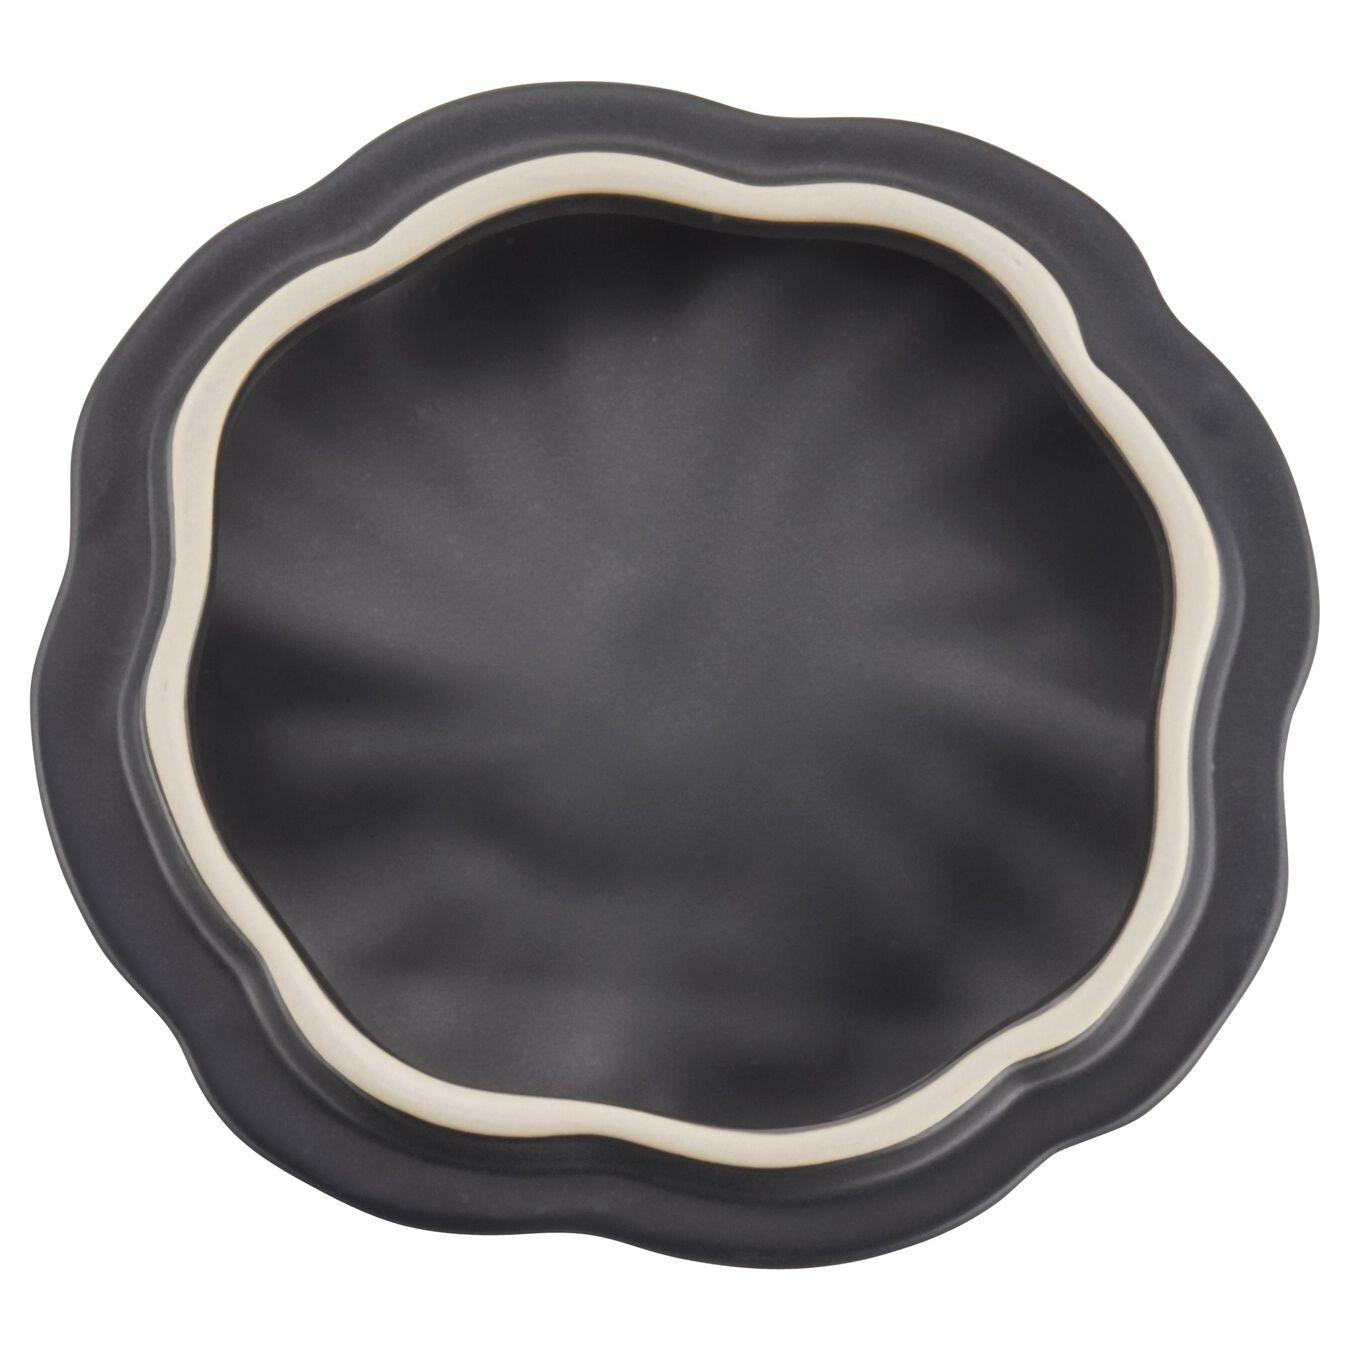 Cocotte 15 cm, Kürbis, Schwarz, Keramik,,large 8